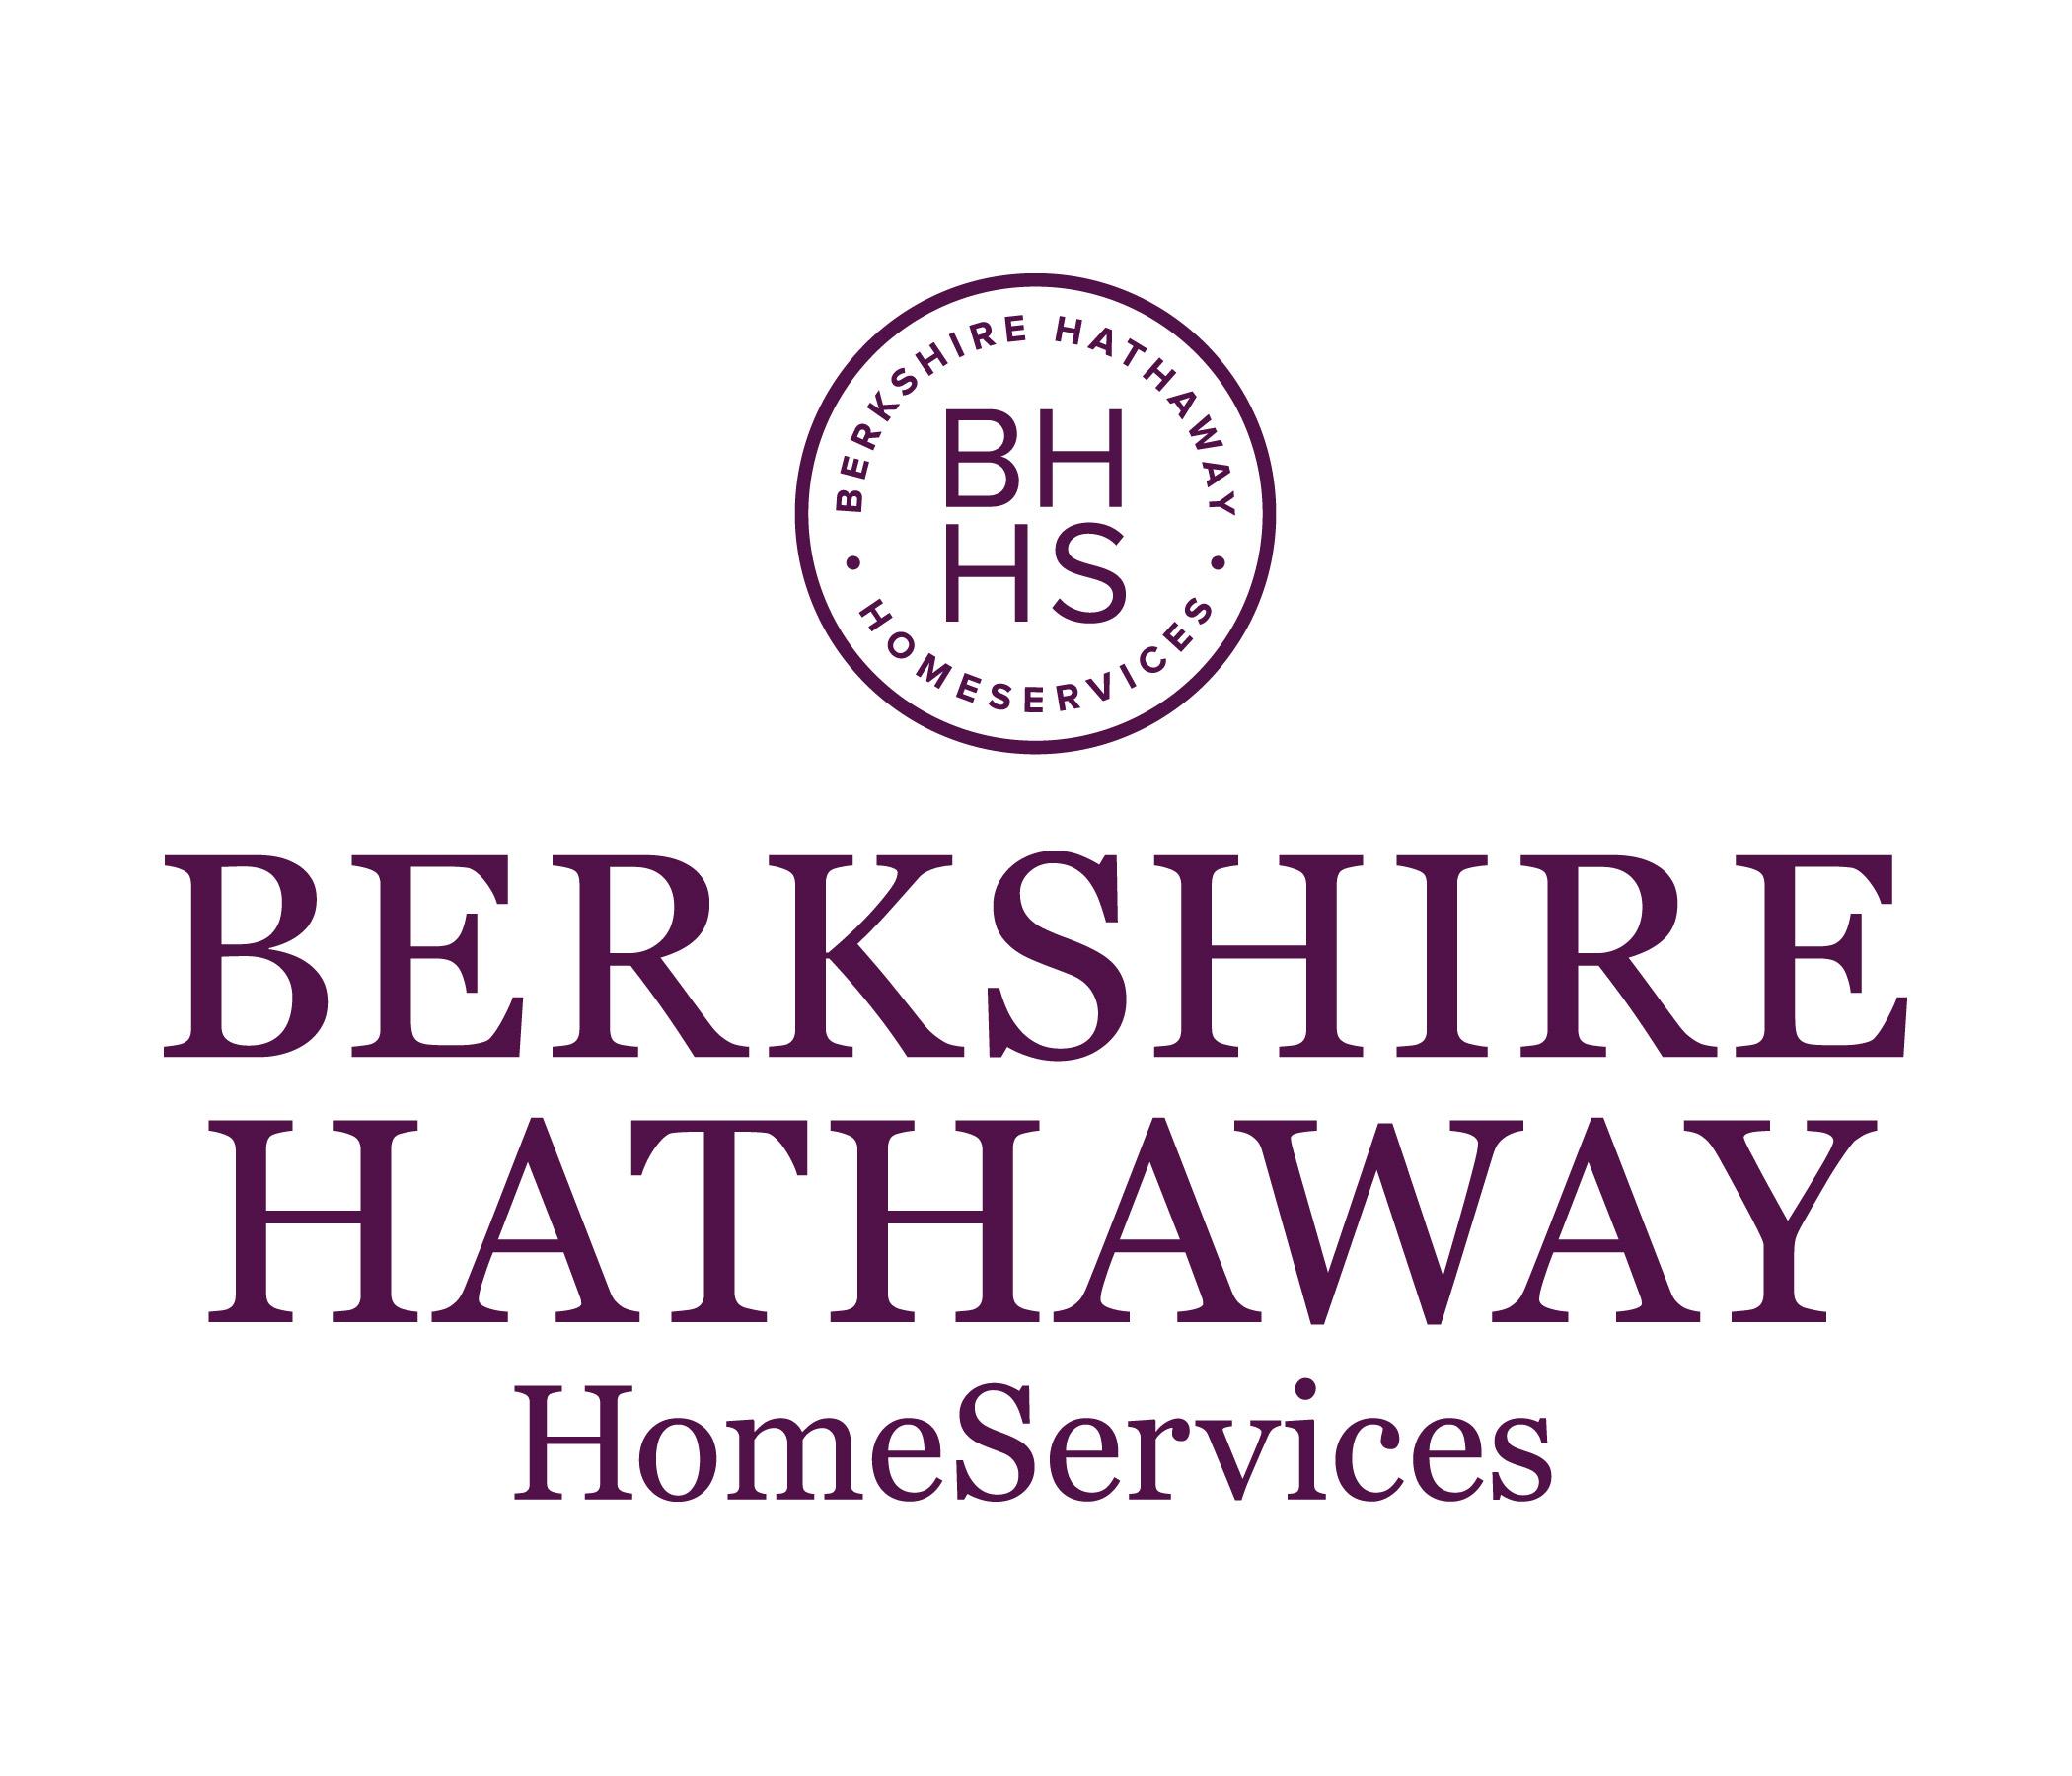 Berkshire-Hathaway-Homeservices_Logo